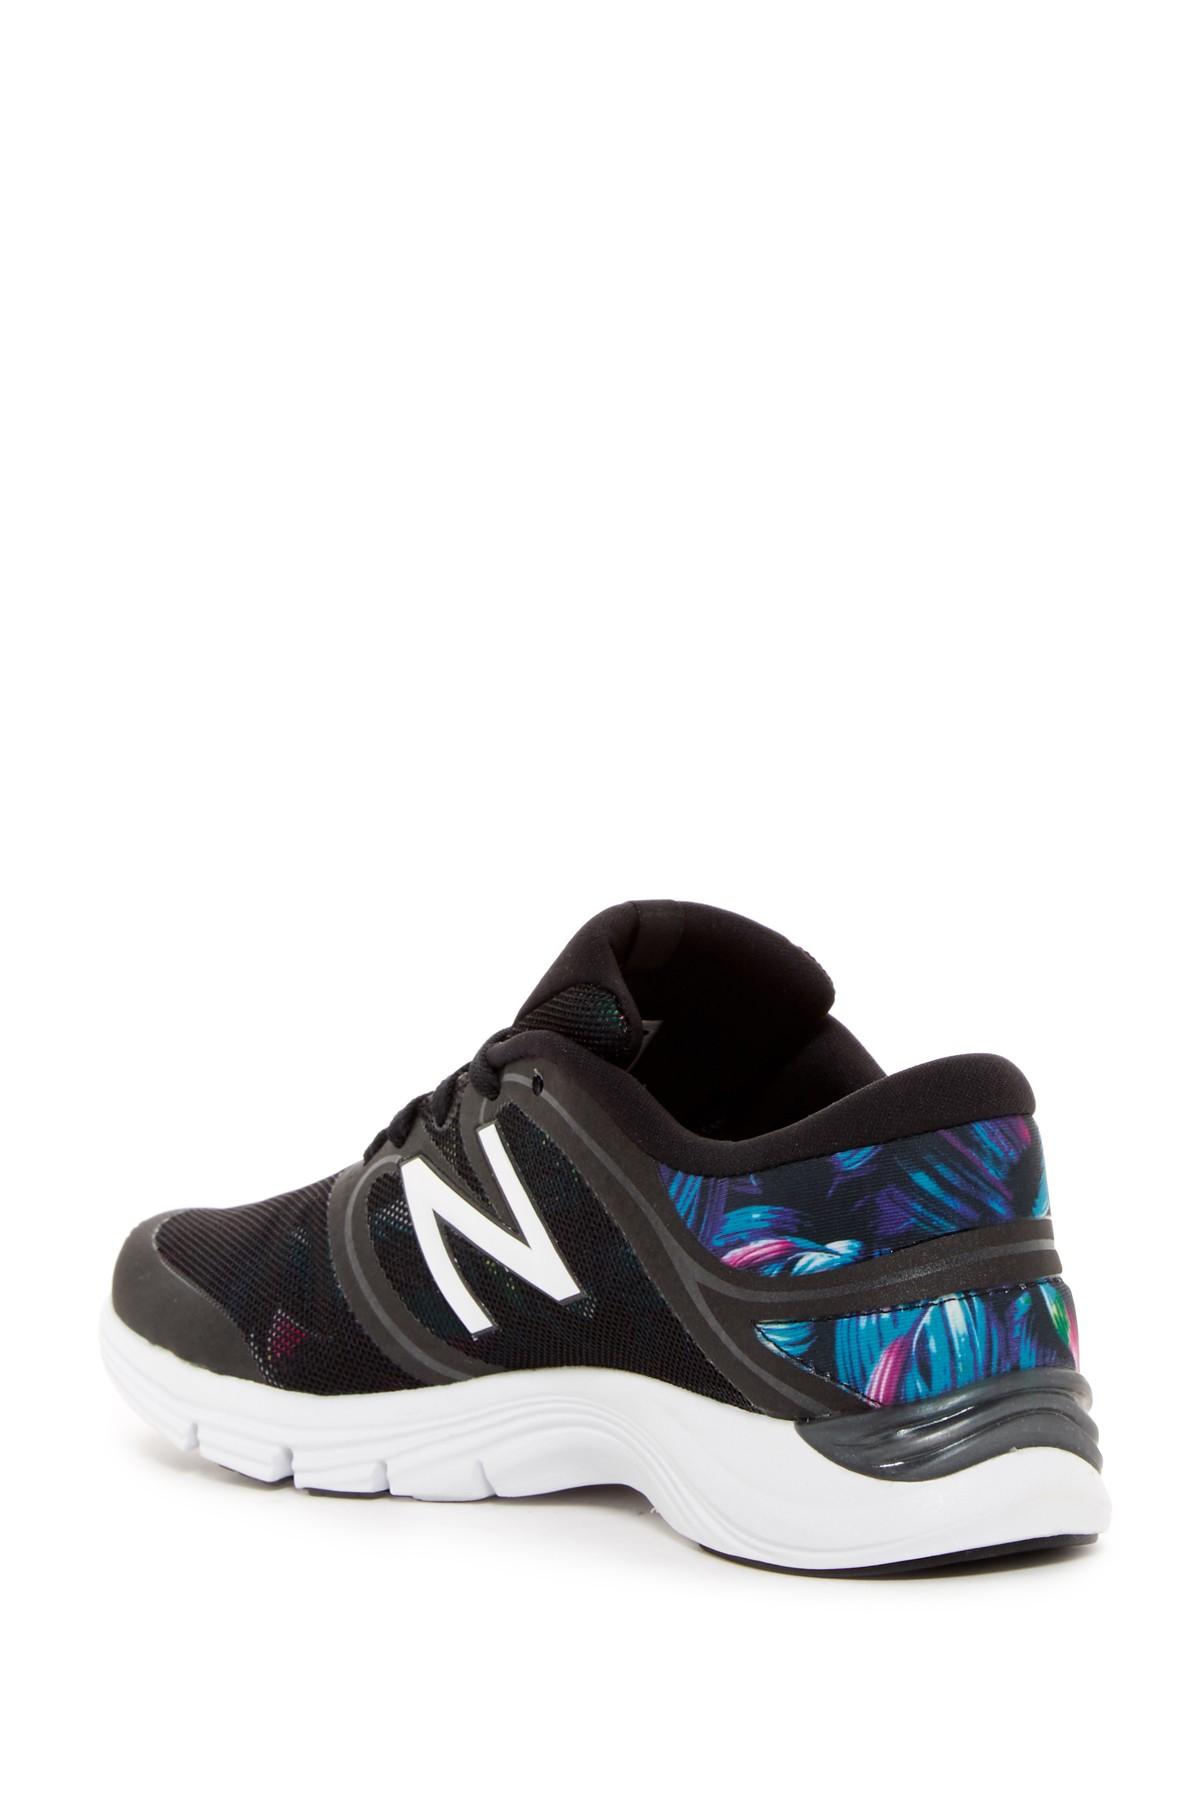 Walking Shoes Nordstrom Rack